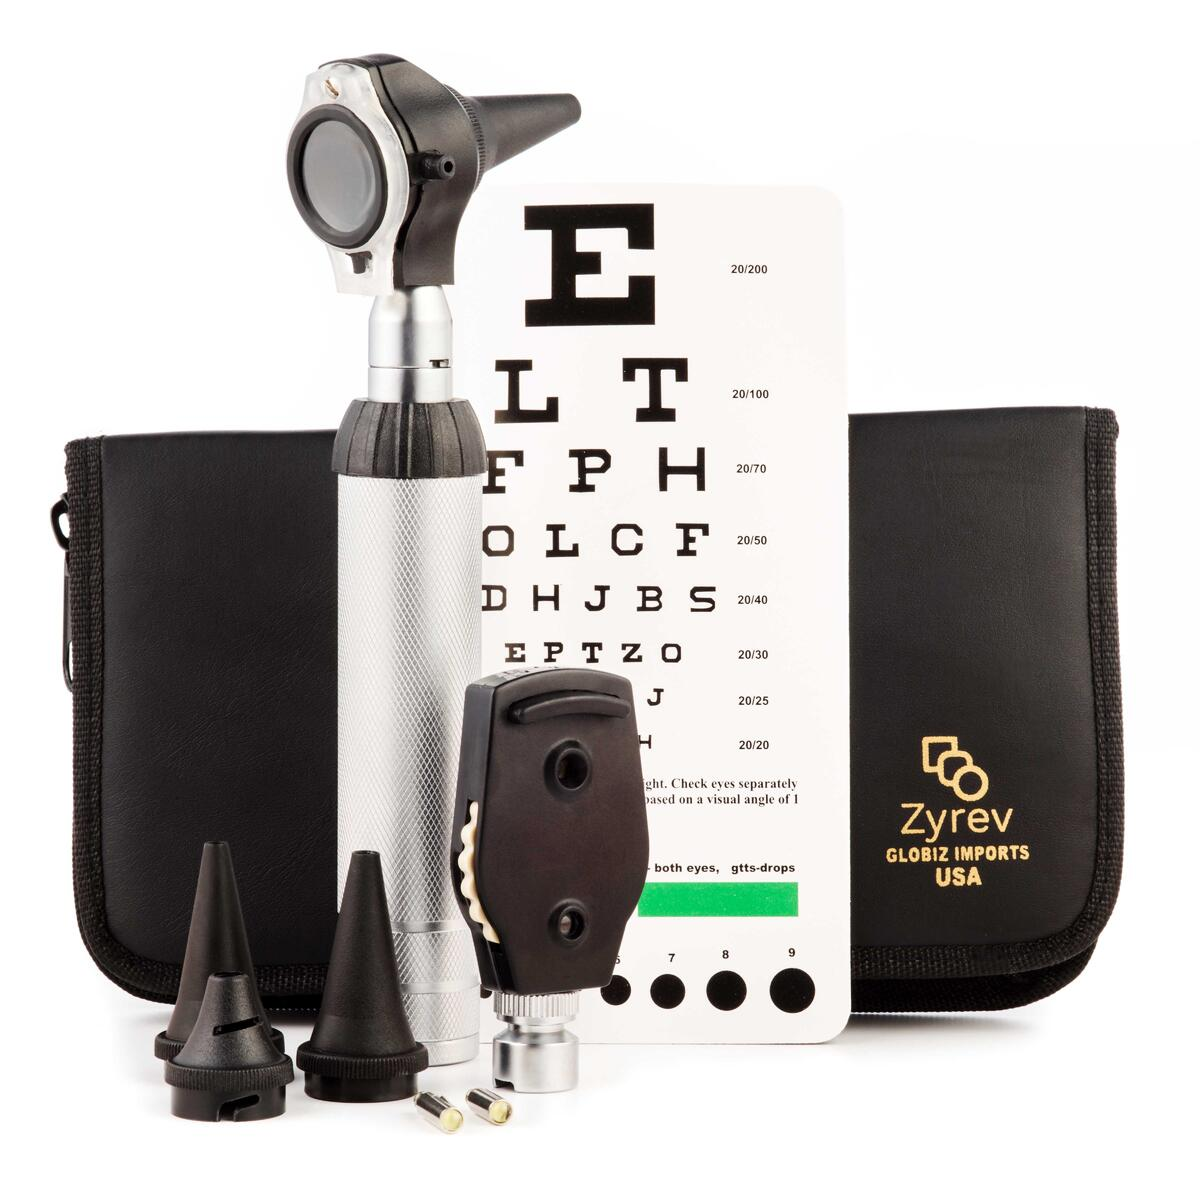 ZetaLife 2 in 1 Ear Scope Set - Multi-Function Otoscope for Ear, Nose & Eye Examination